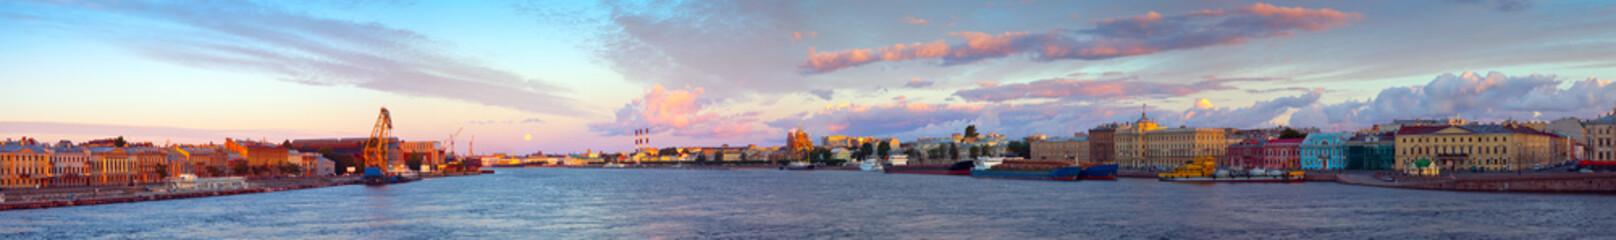 Panorama of Neva river in morning. Saint Petersburg